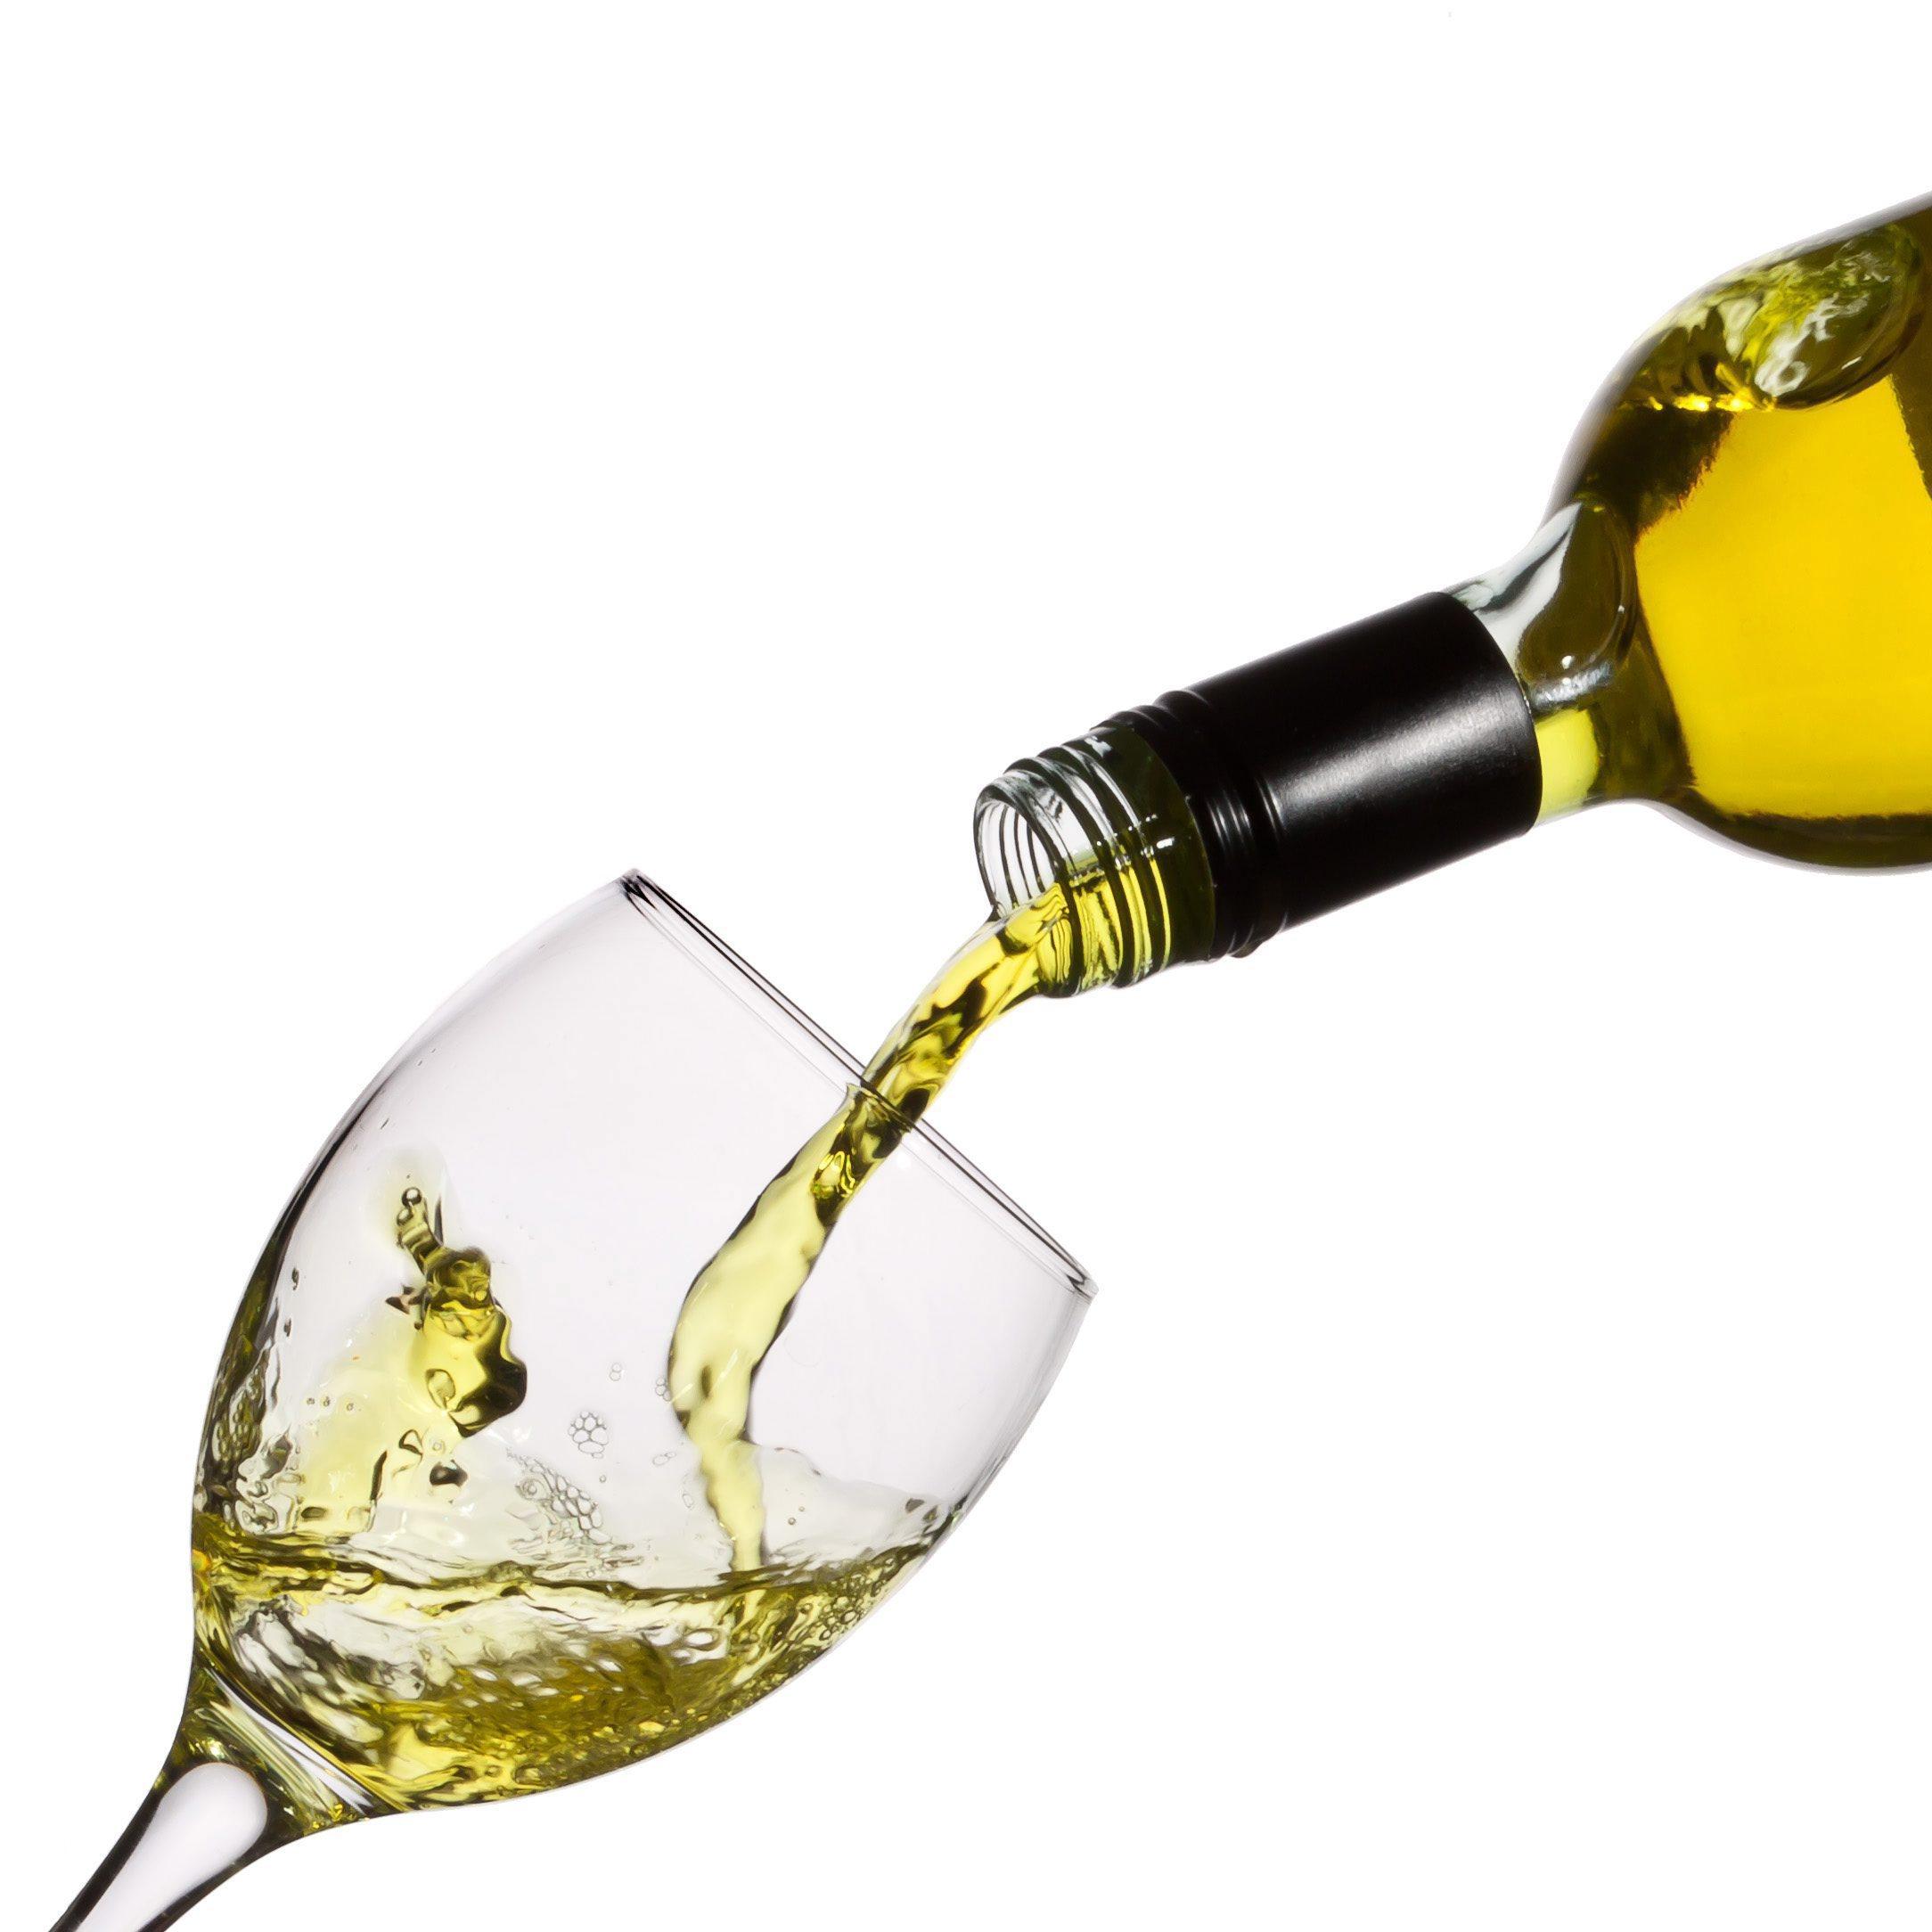 Neil Ellis Launches 2 New White Wines For Sauvignon Blanc Day #sauvblancday photo